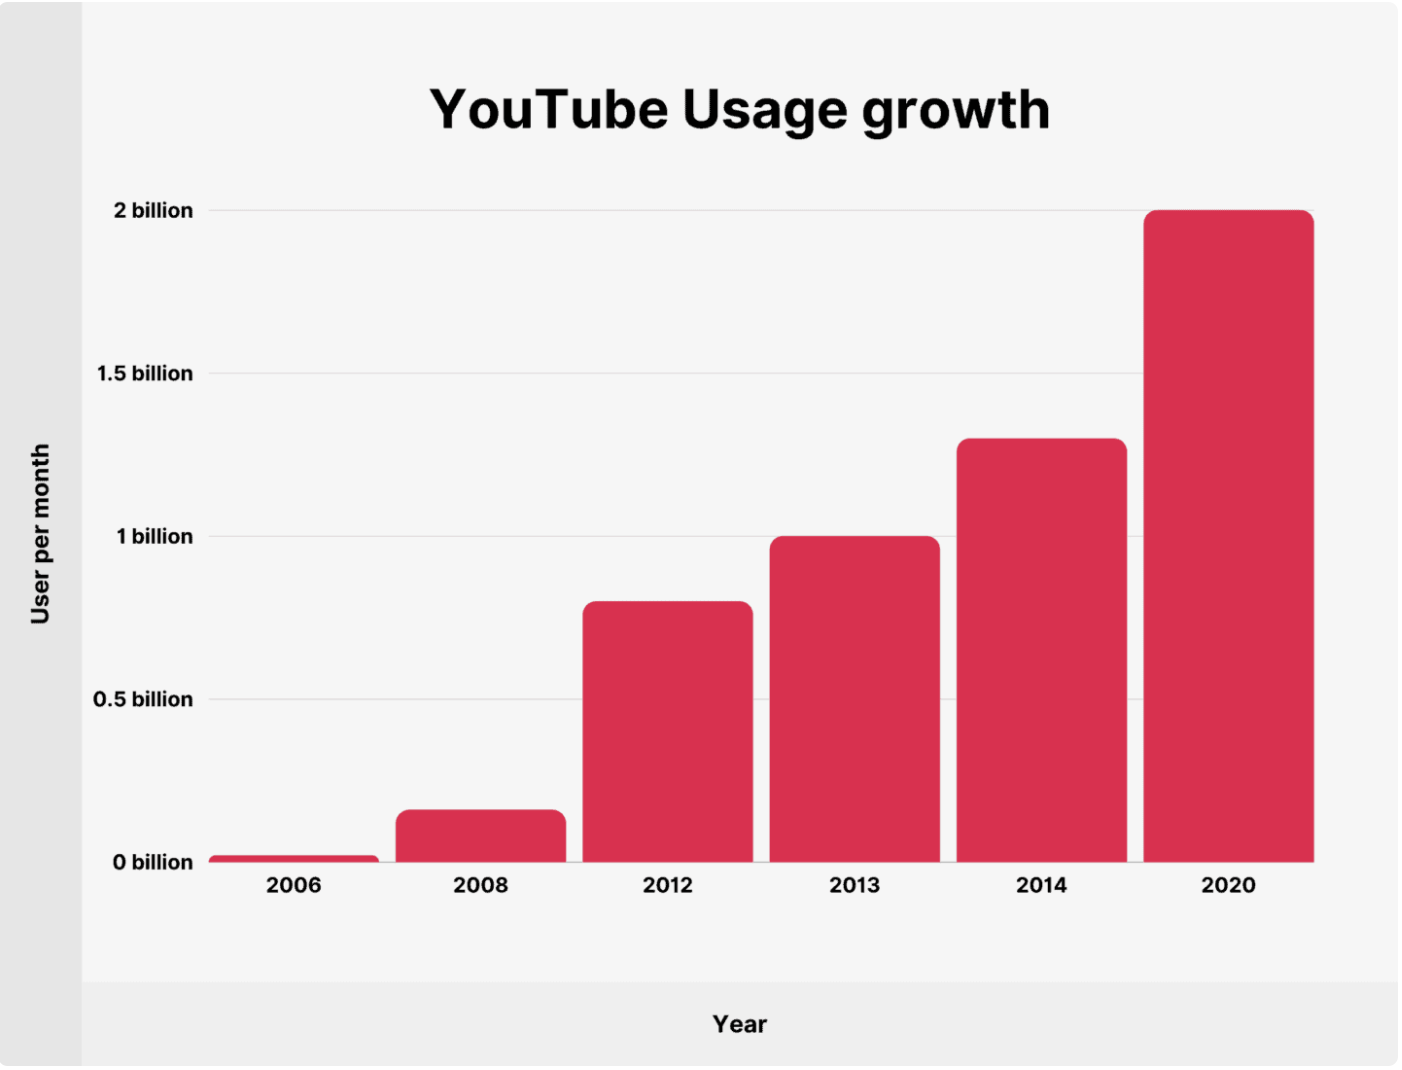 Backlinko YouTub Usage Growth 2006-2020 Graphic